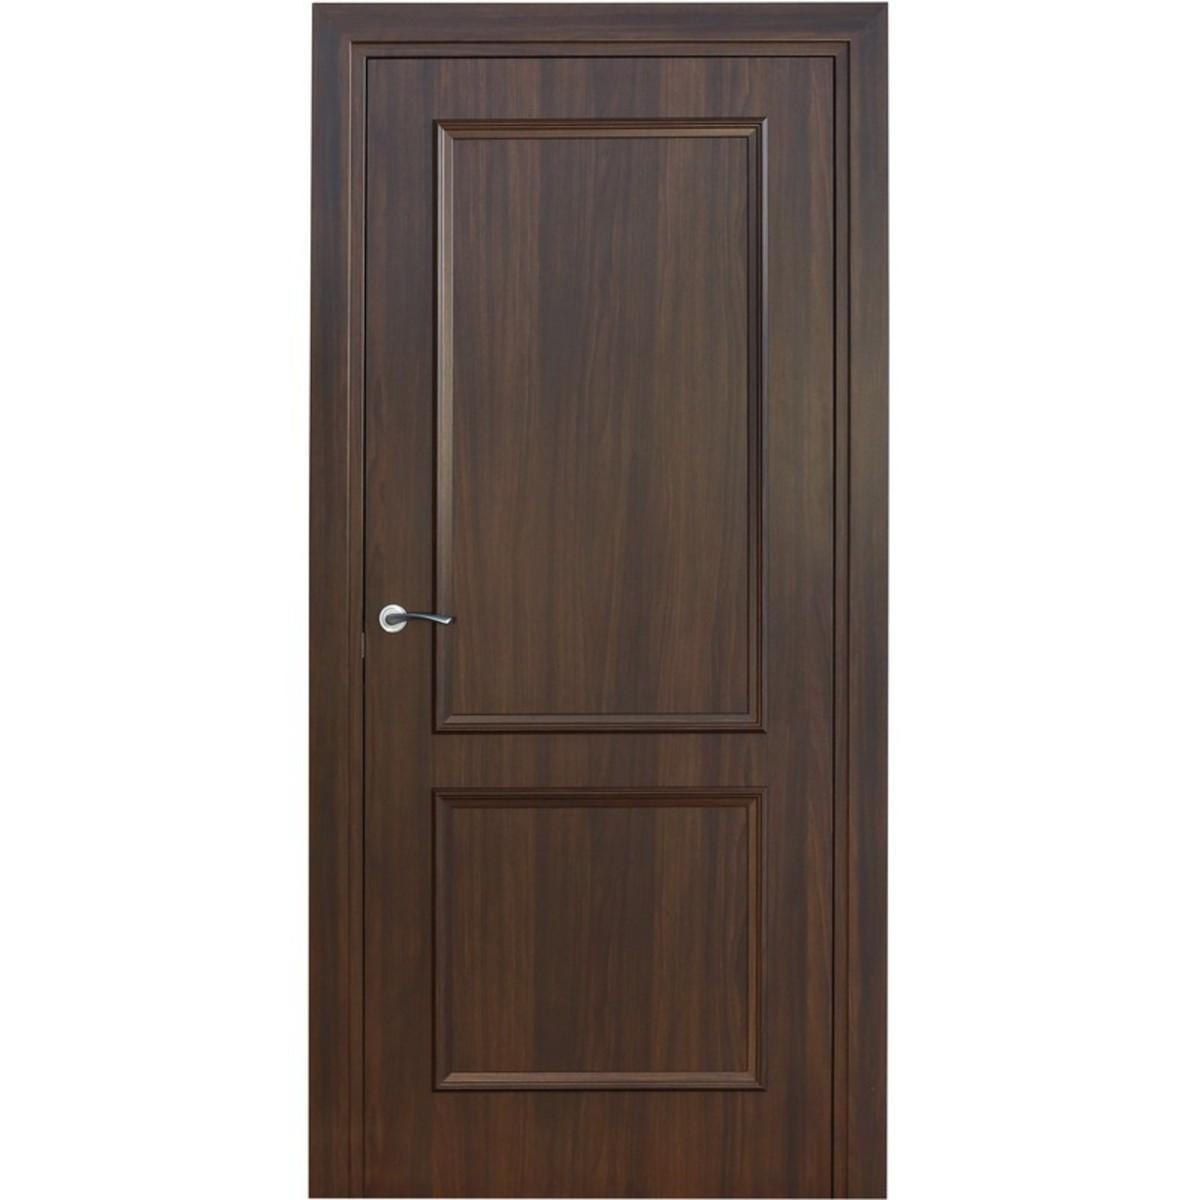 Дверь Межкомнатная Глухая Altro 80x200 Ламинация Цвет Орех Марроне